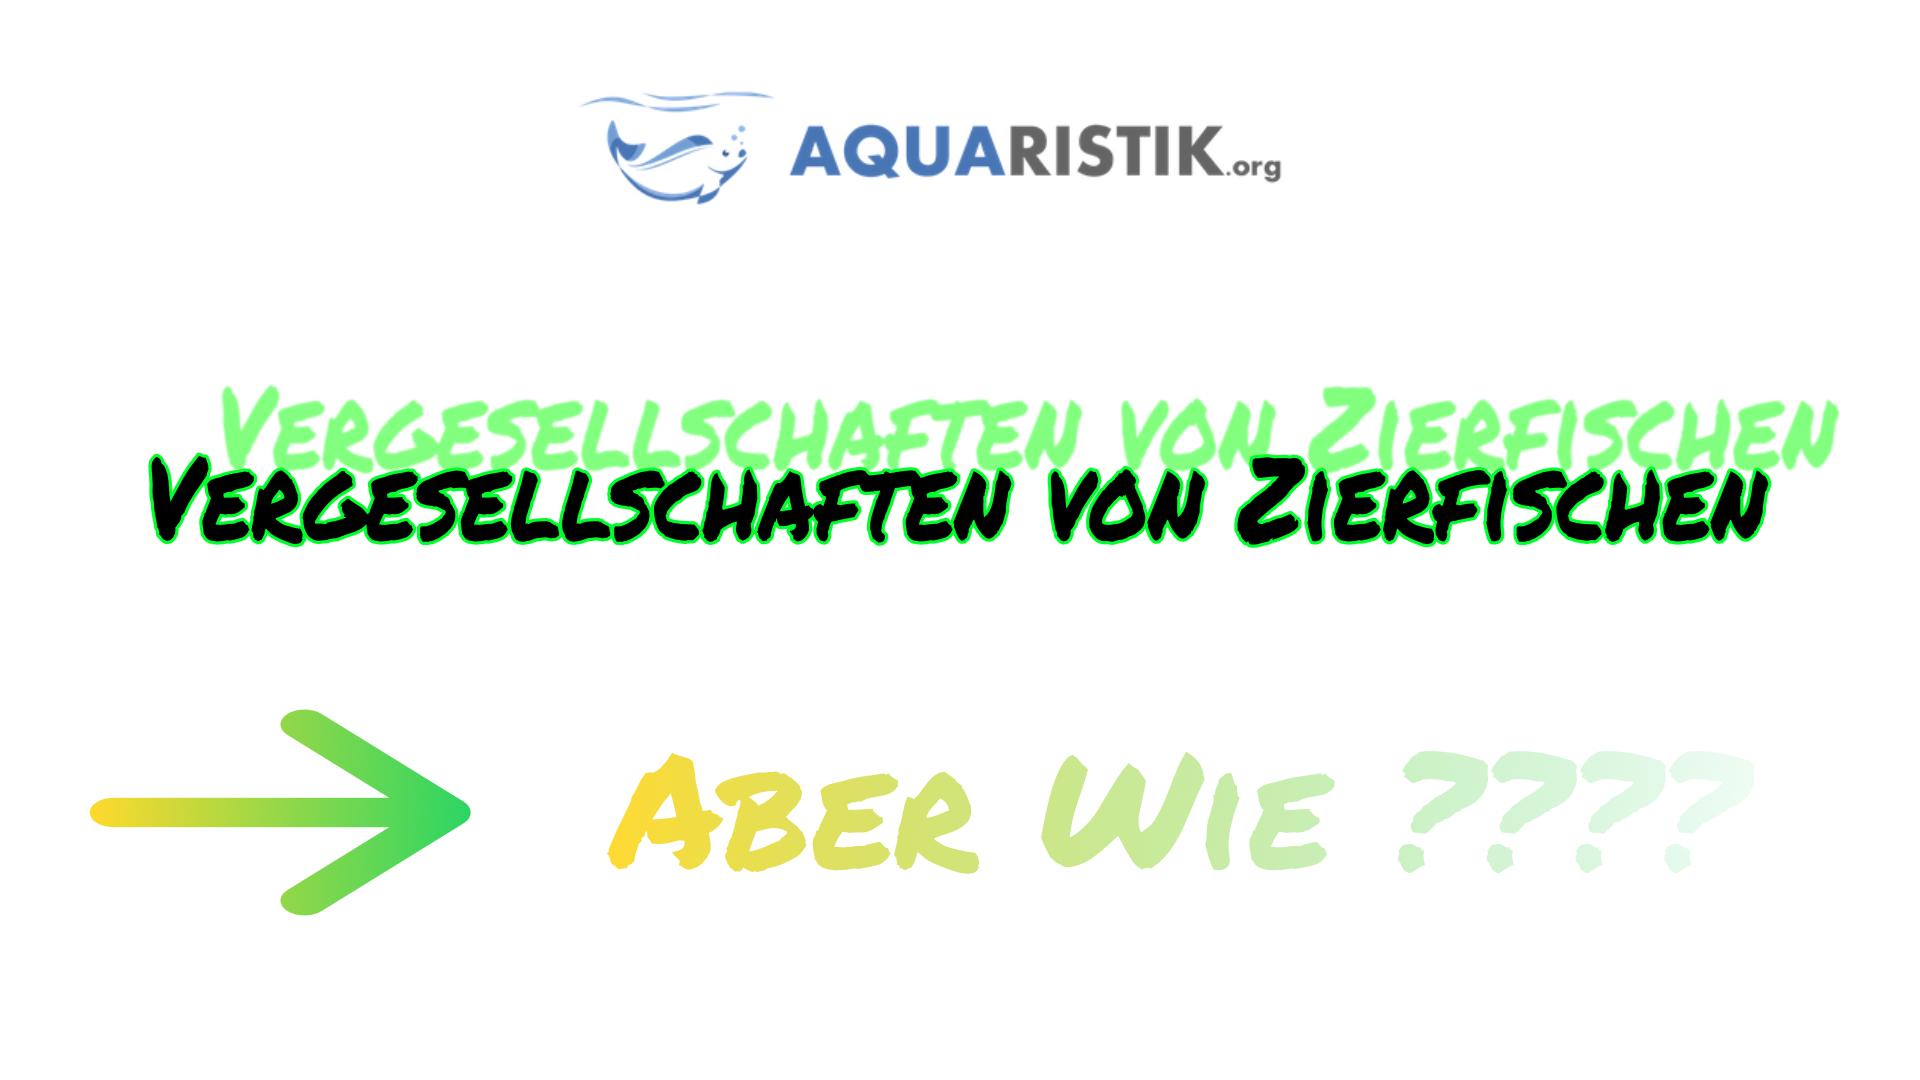 ergesellschaftung Aquarium